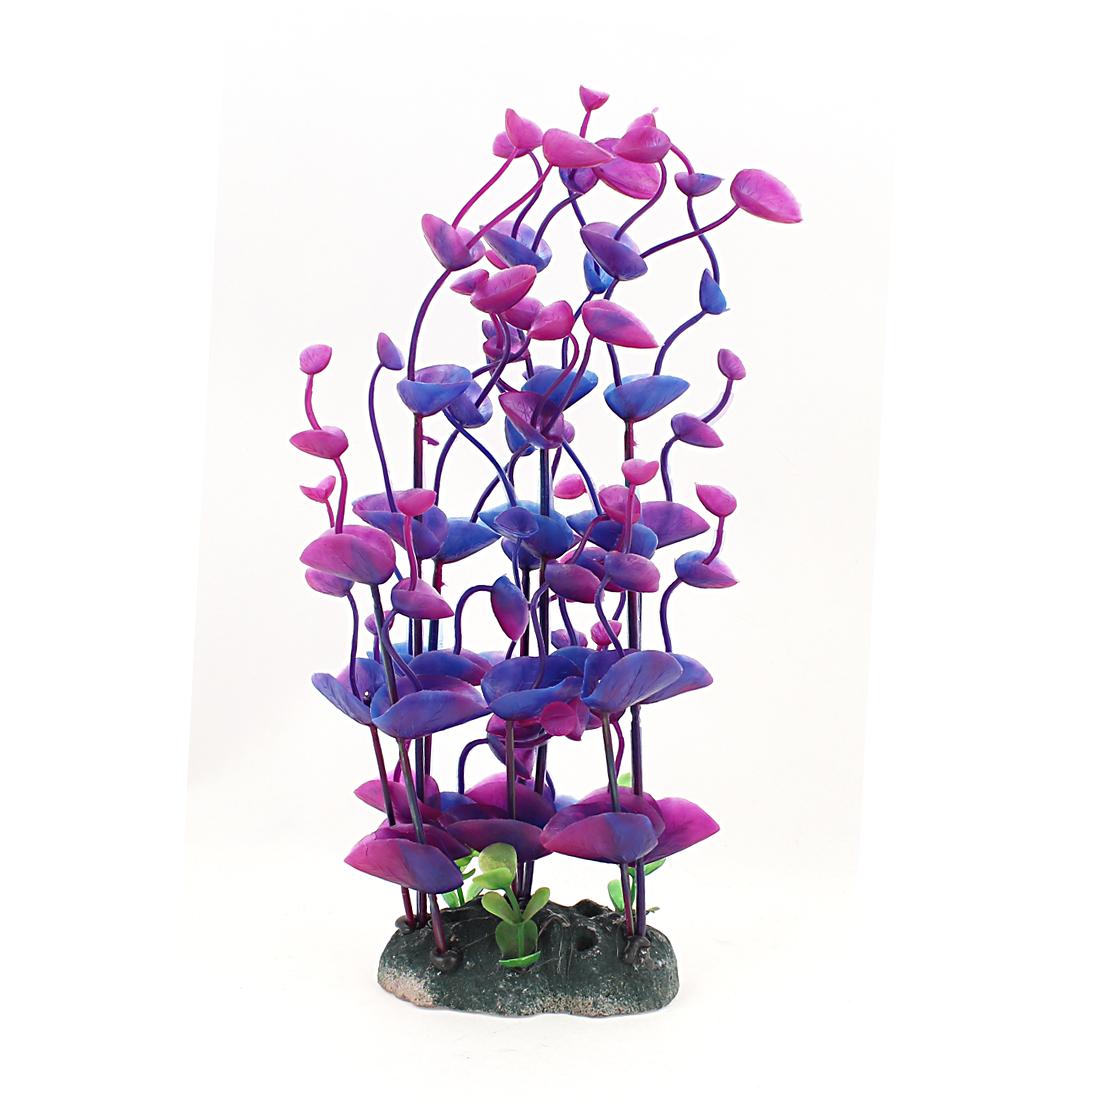 "8.7"" Artificial Plastic Plants Purple Petal for Water Fish Tank"